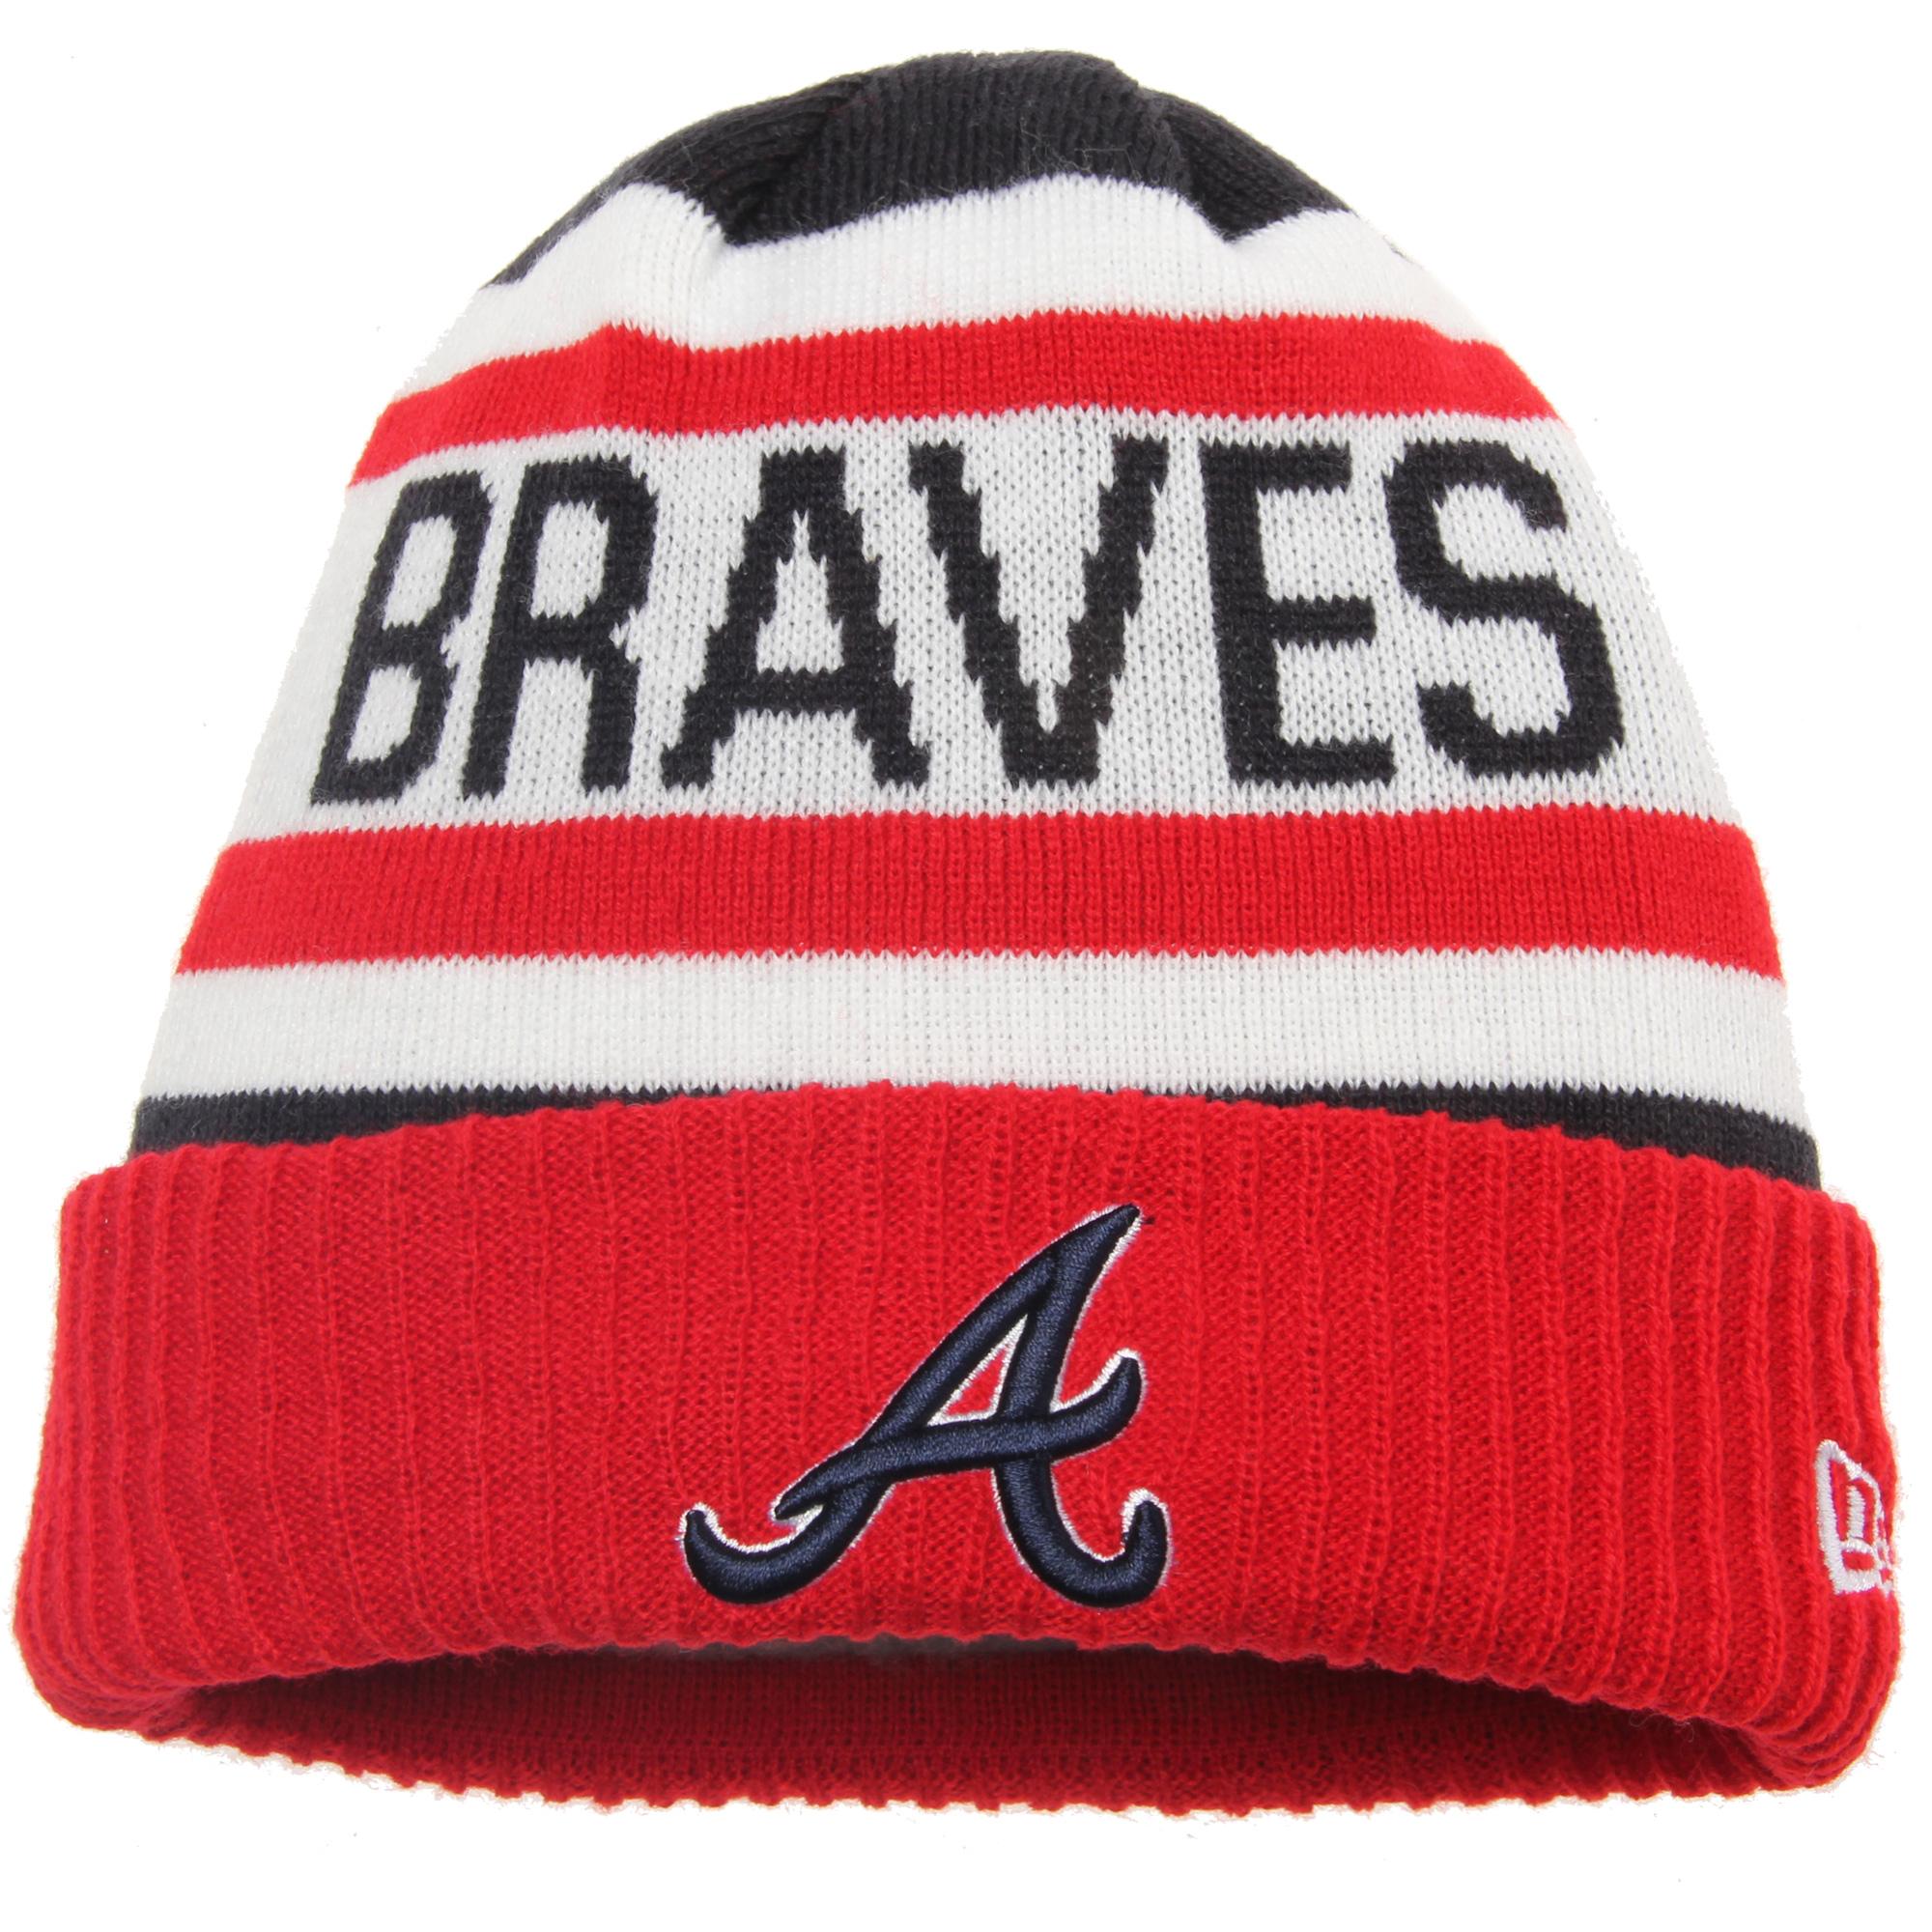 New Atlanta Braves Era Youth Biggest Fan 2.0 Cuffed Knit Hat - White/Orange - OSFA